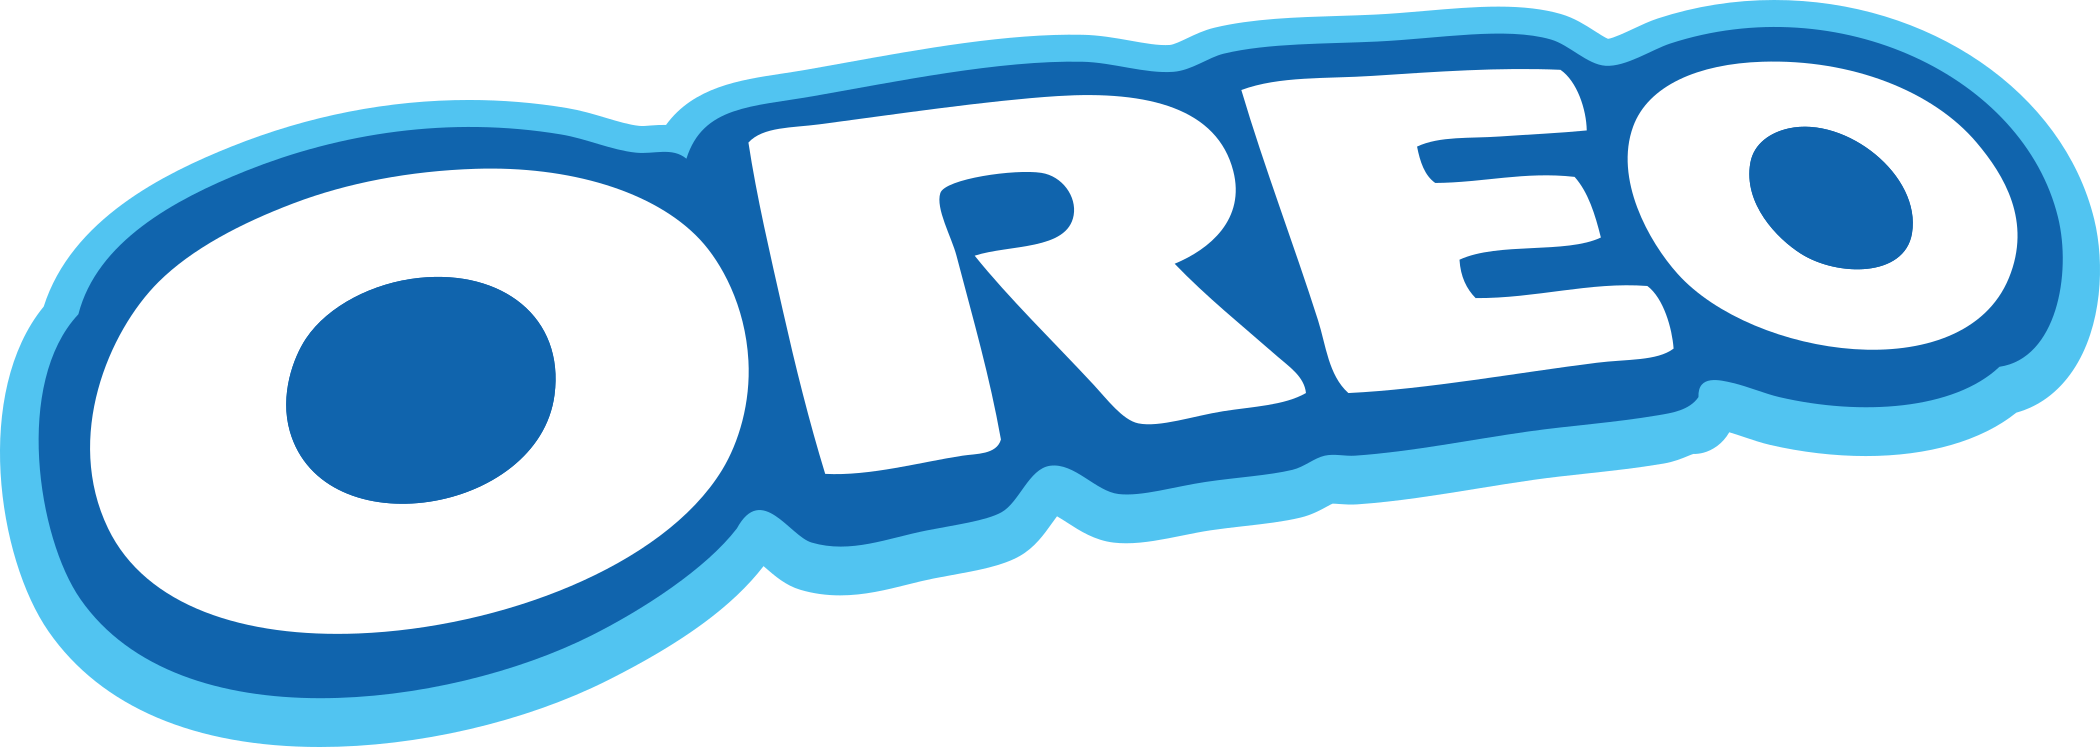 image transparent library Oreo clipart emblem. Logo logodownload org download.